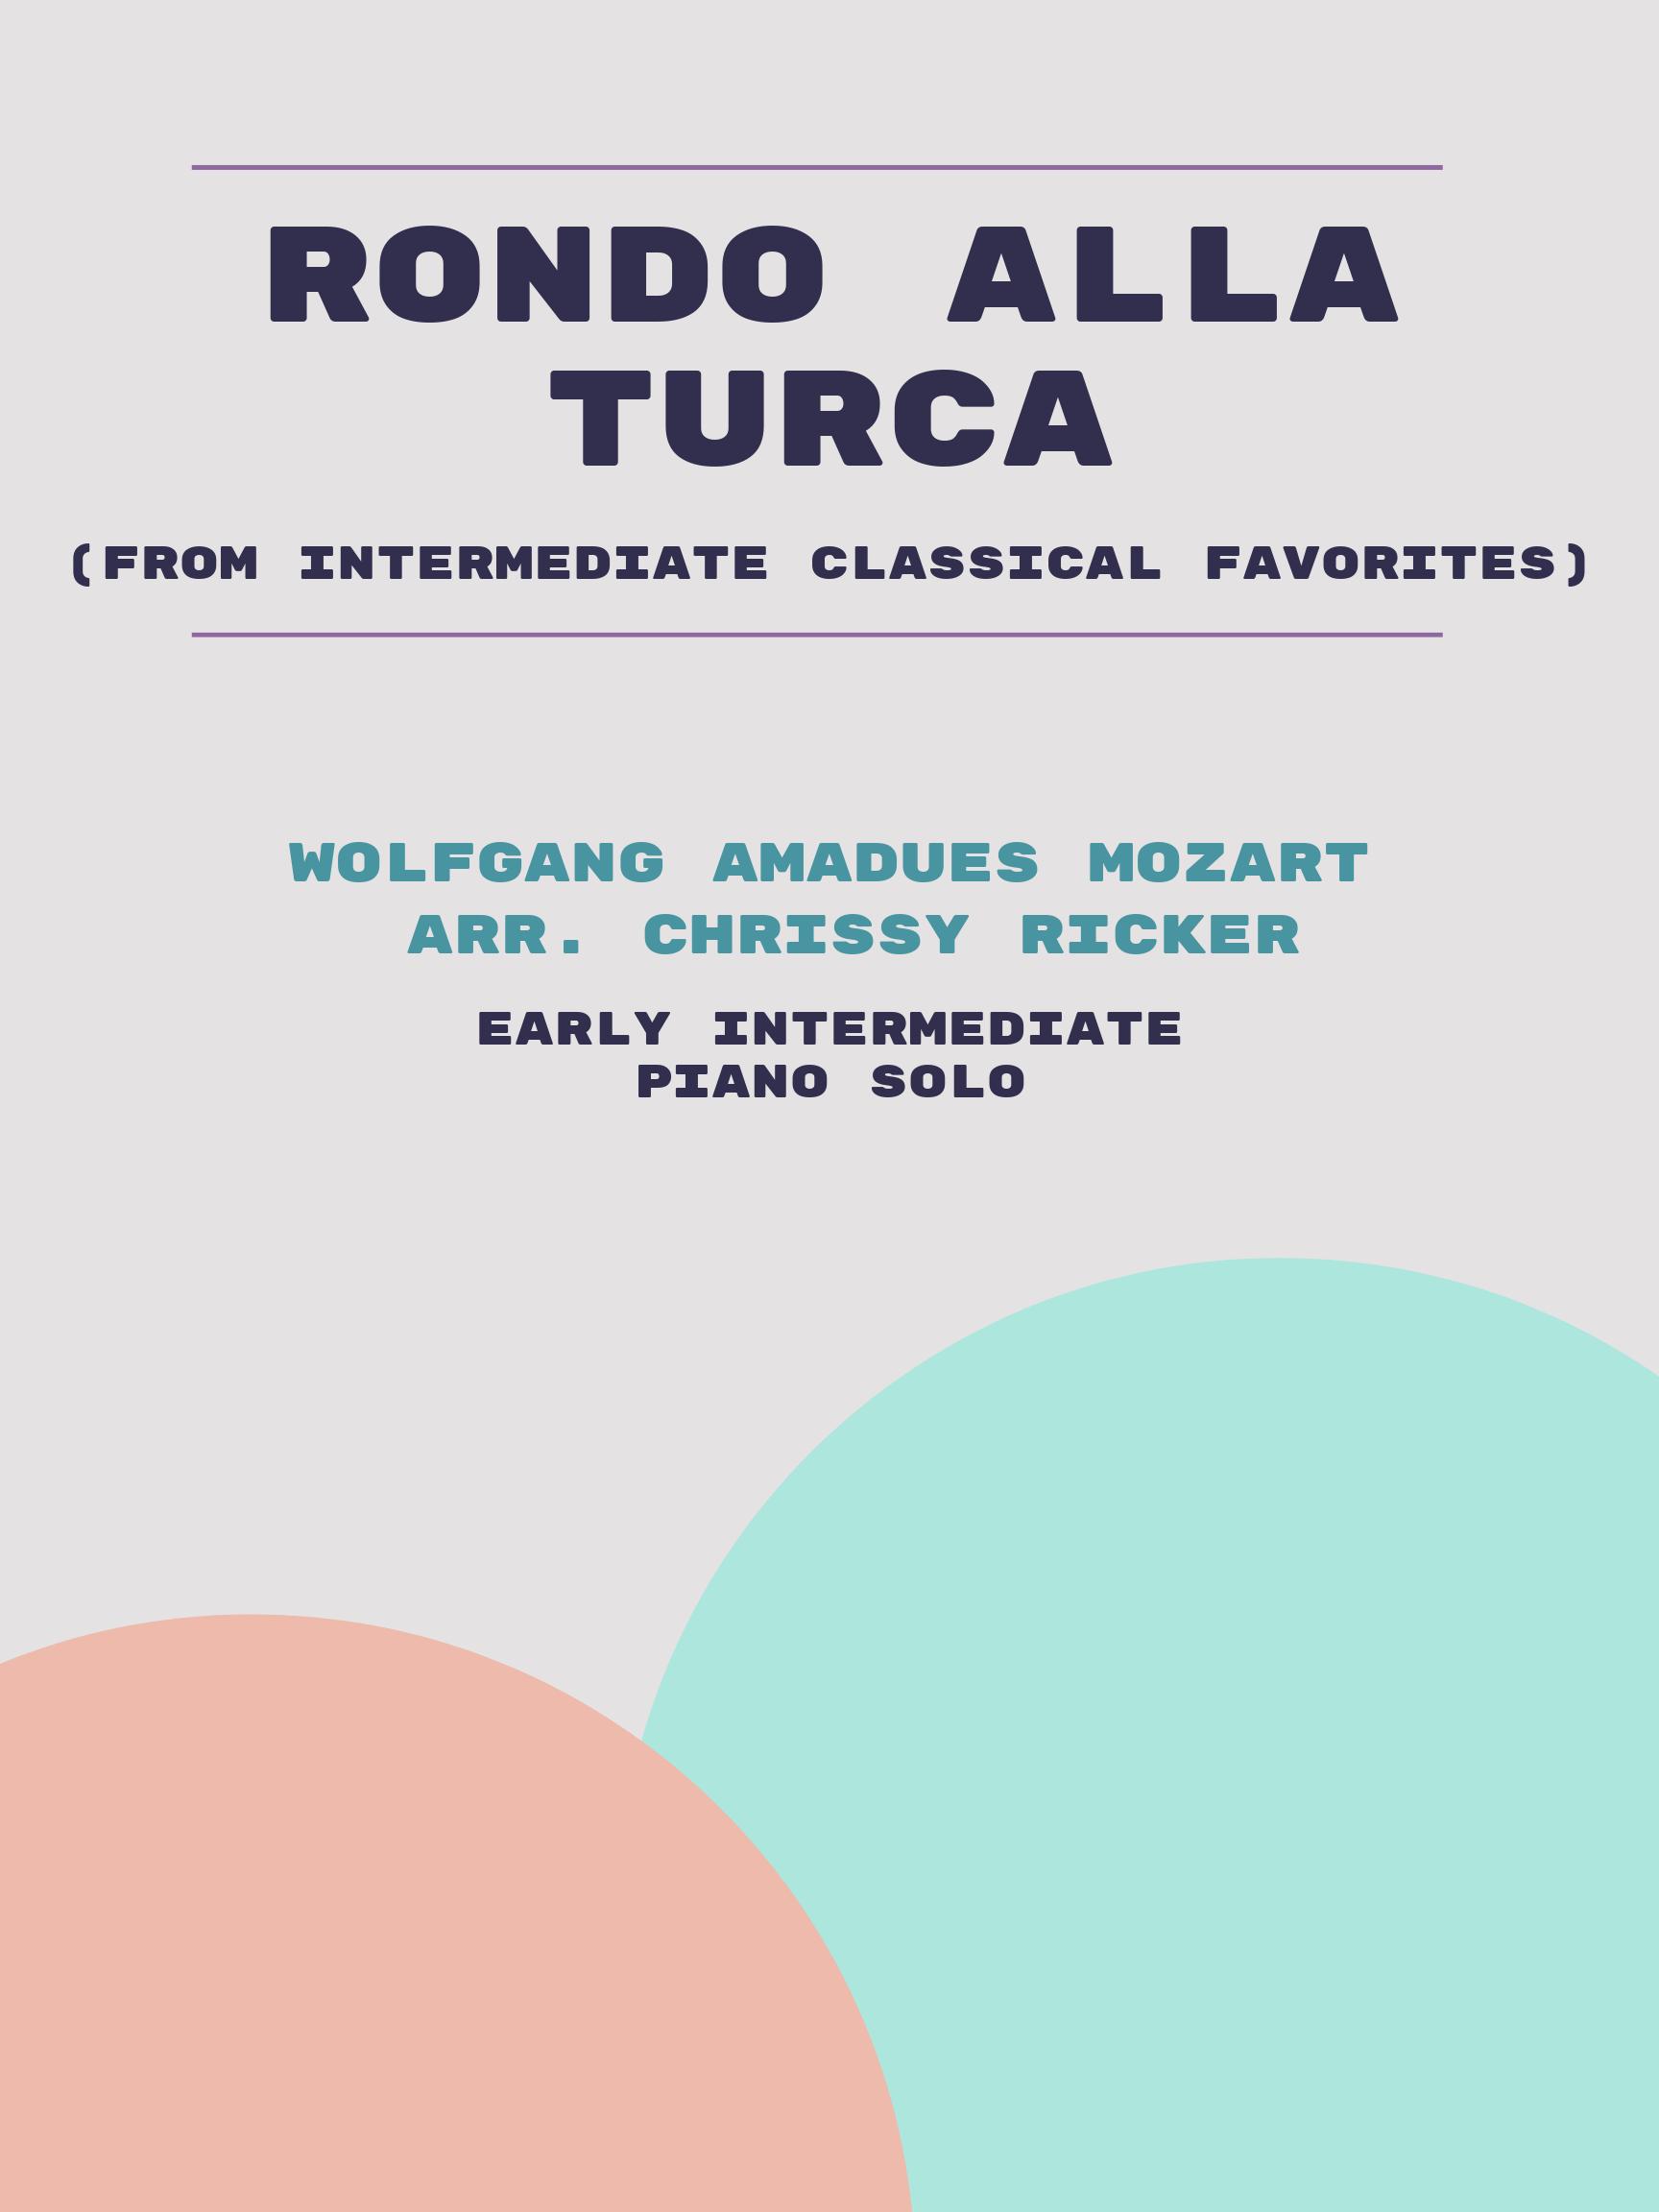 Rondo alla Turca by Wolfgang Amadeus Mozart